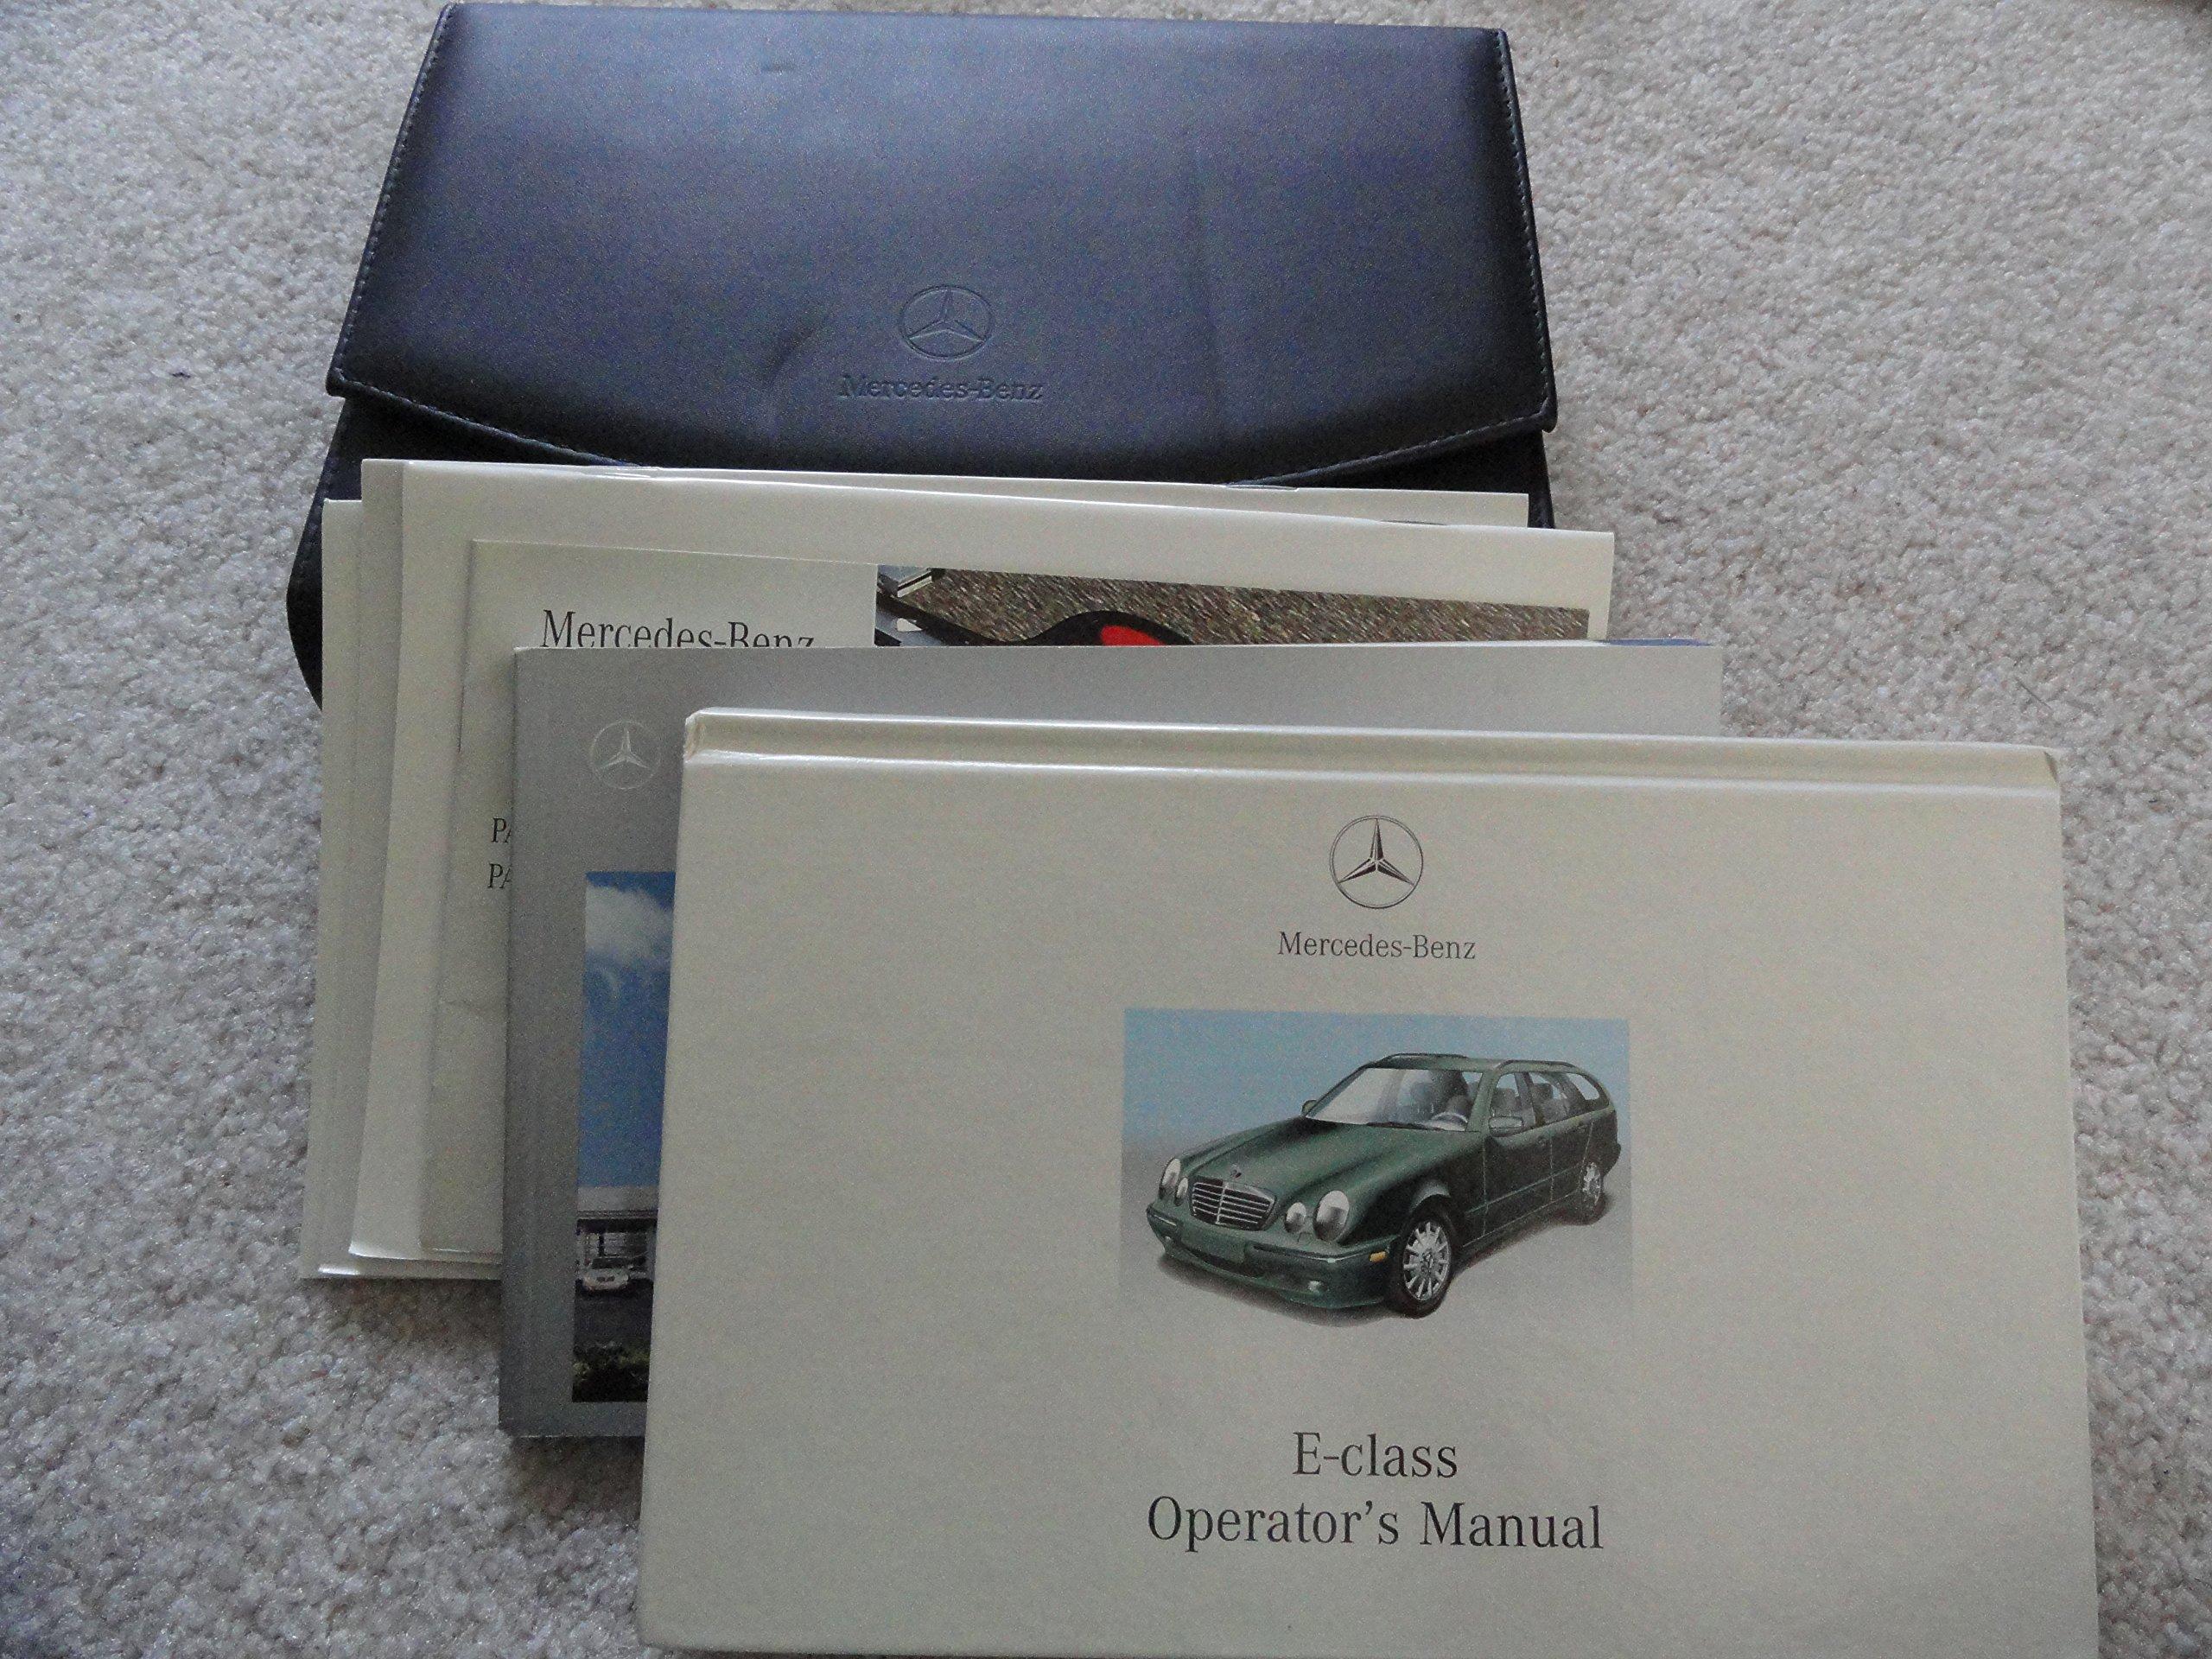 2001 mercedes benz e320 manual